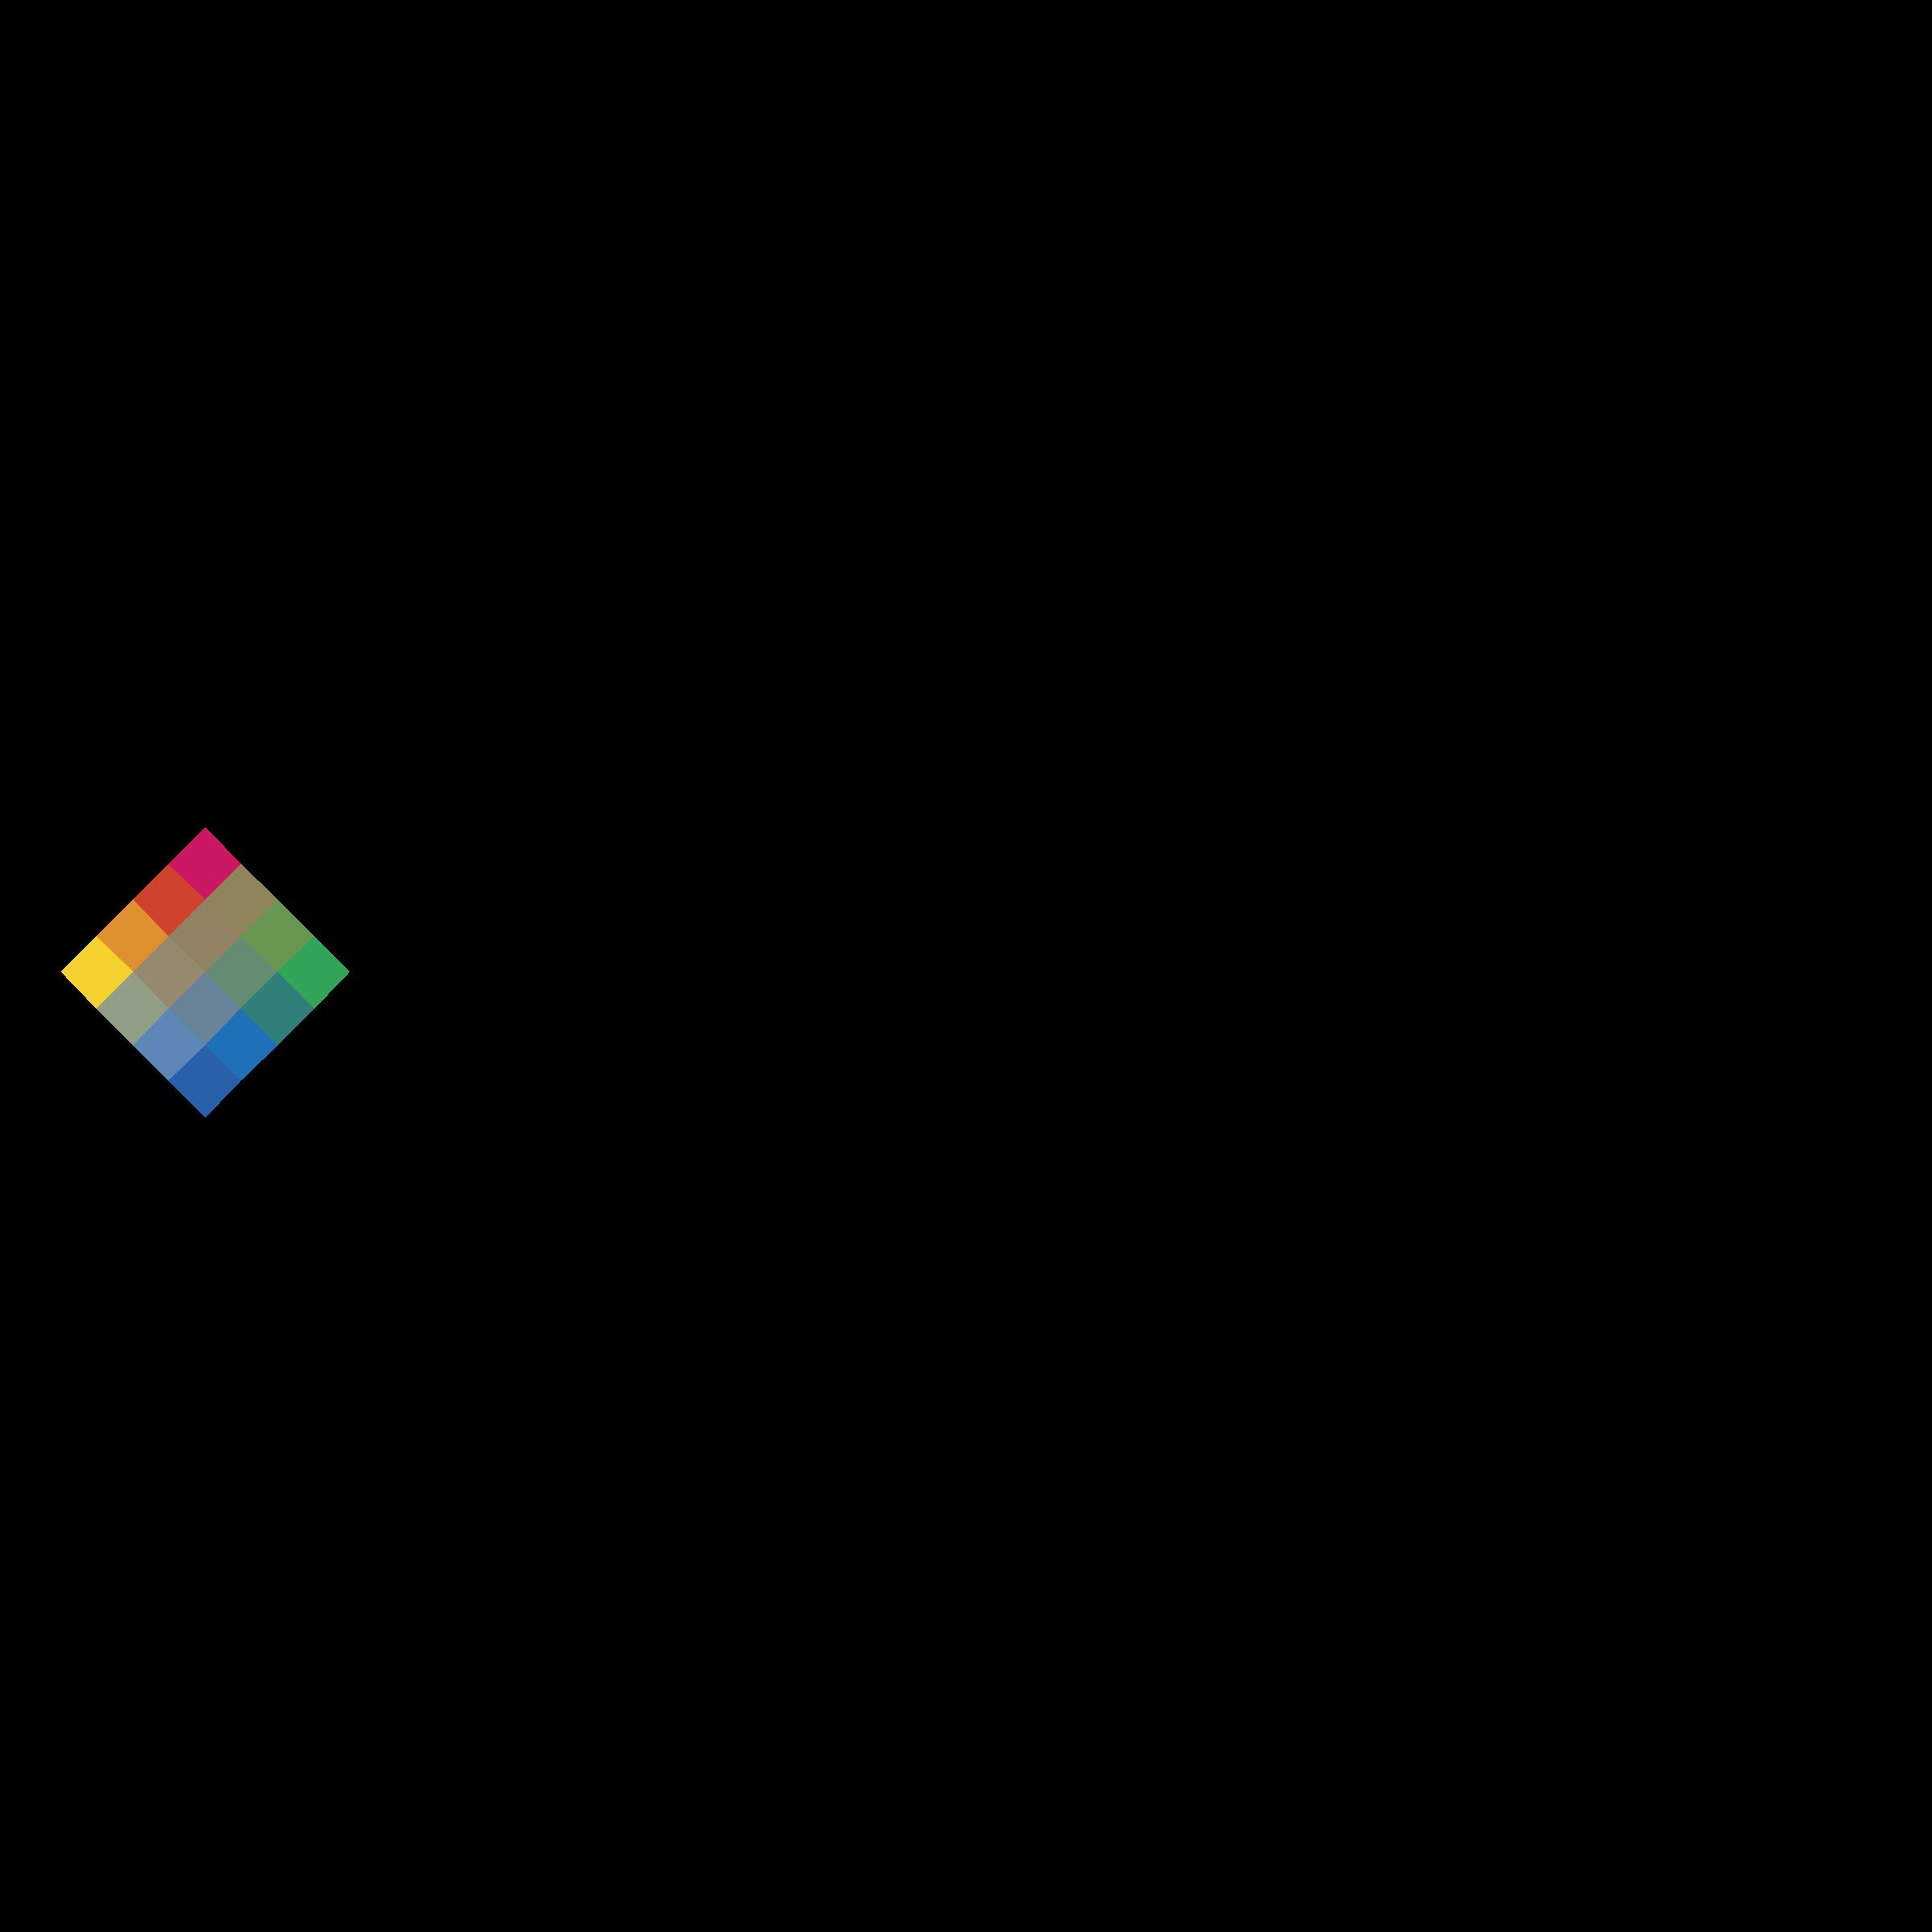 polaroid-logo-png-transparent